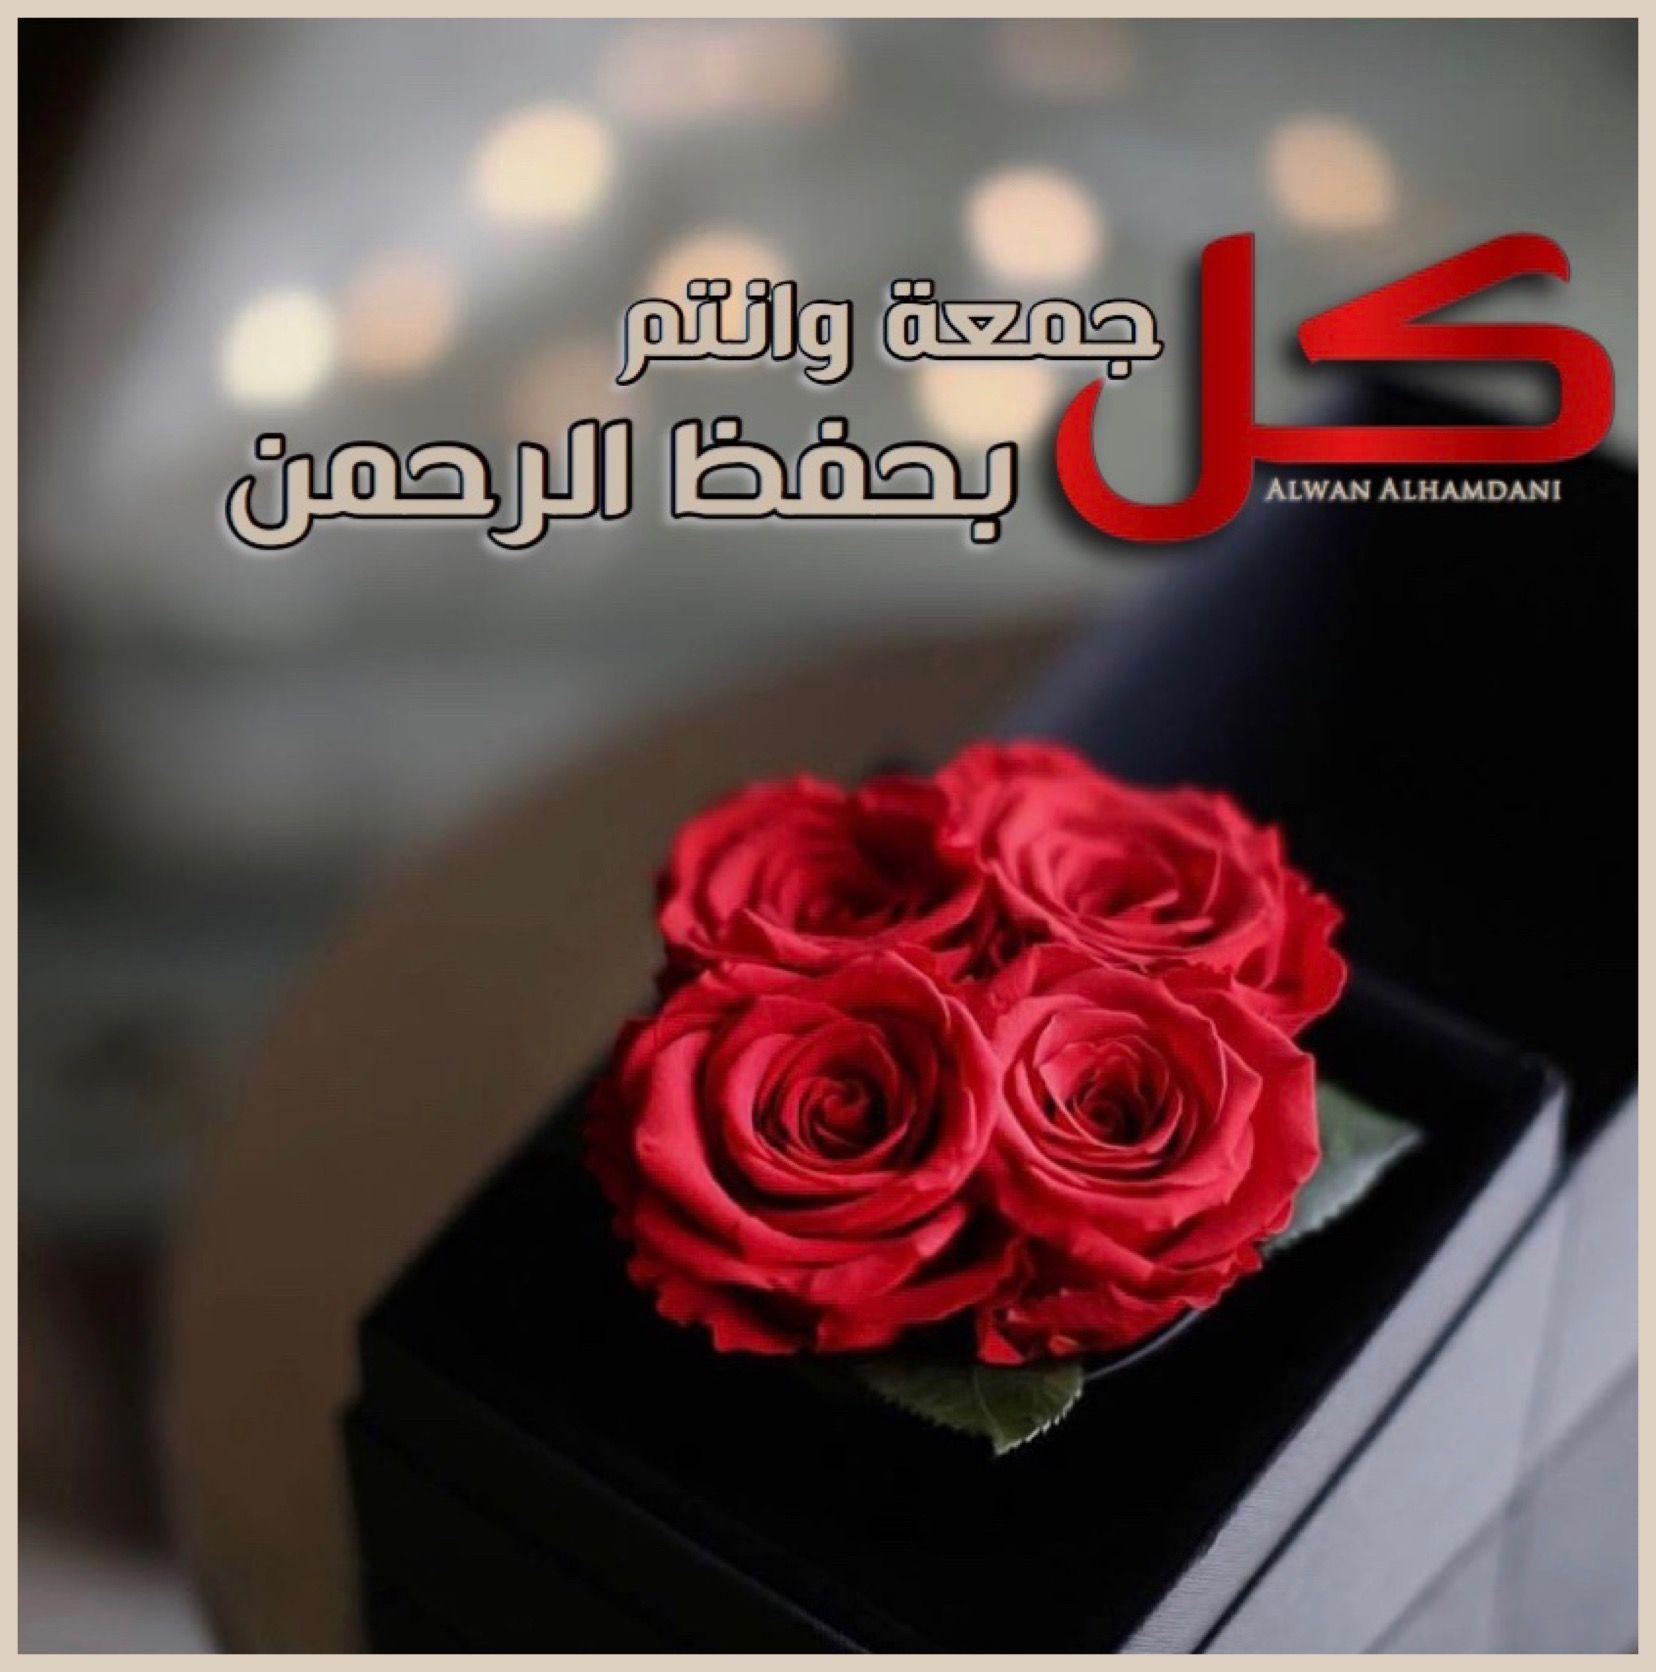 Pin By نوف جراح On جمعه طيبه Beautiful Morning Messages Blessed Friday Ramadan Lantern